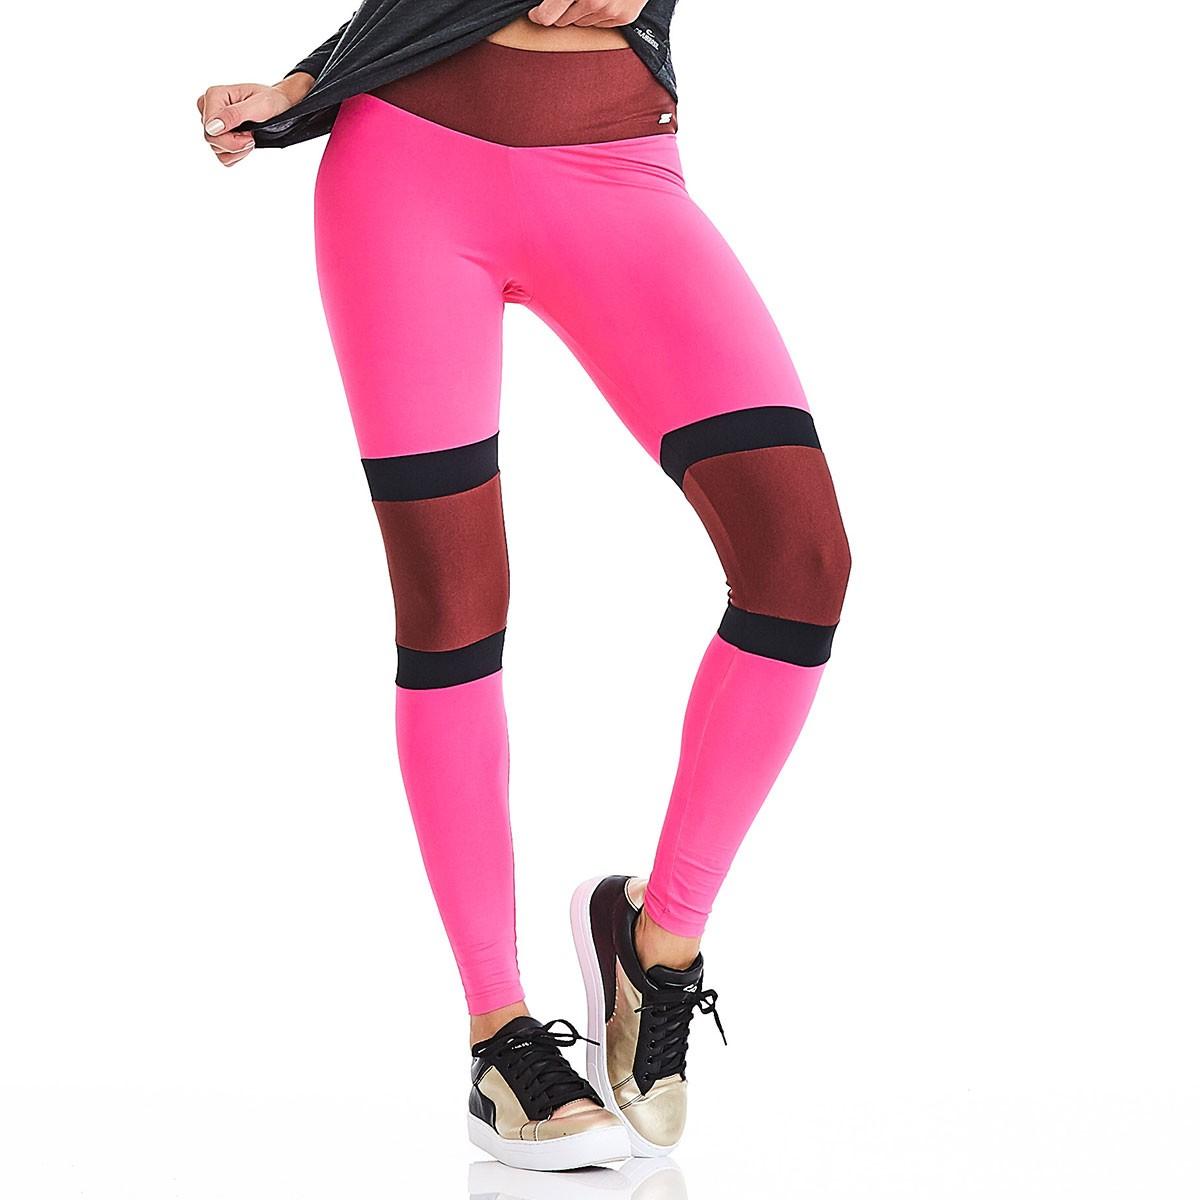 Legging Rock Surf Rosa CAJUBRASIL Activewear